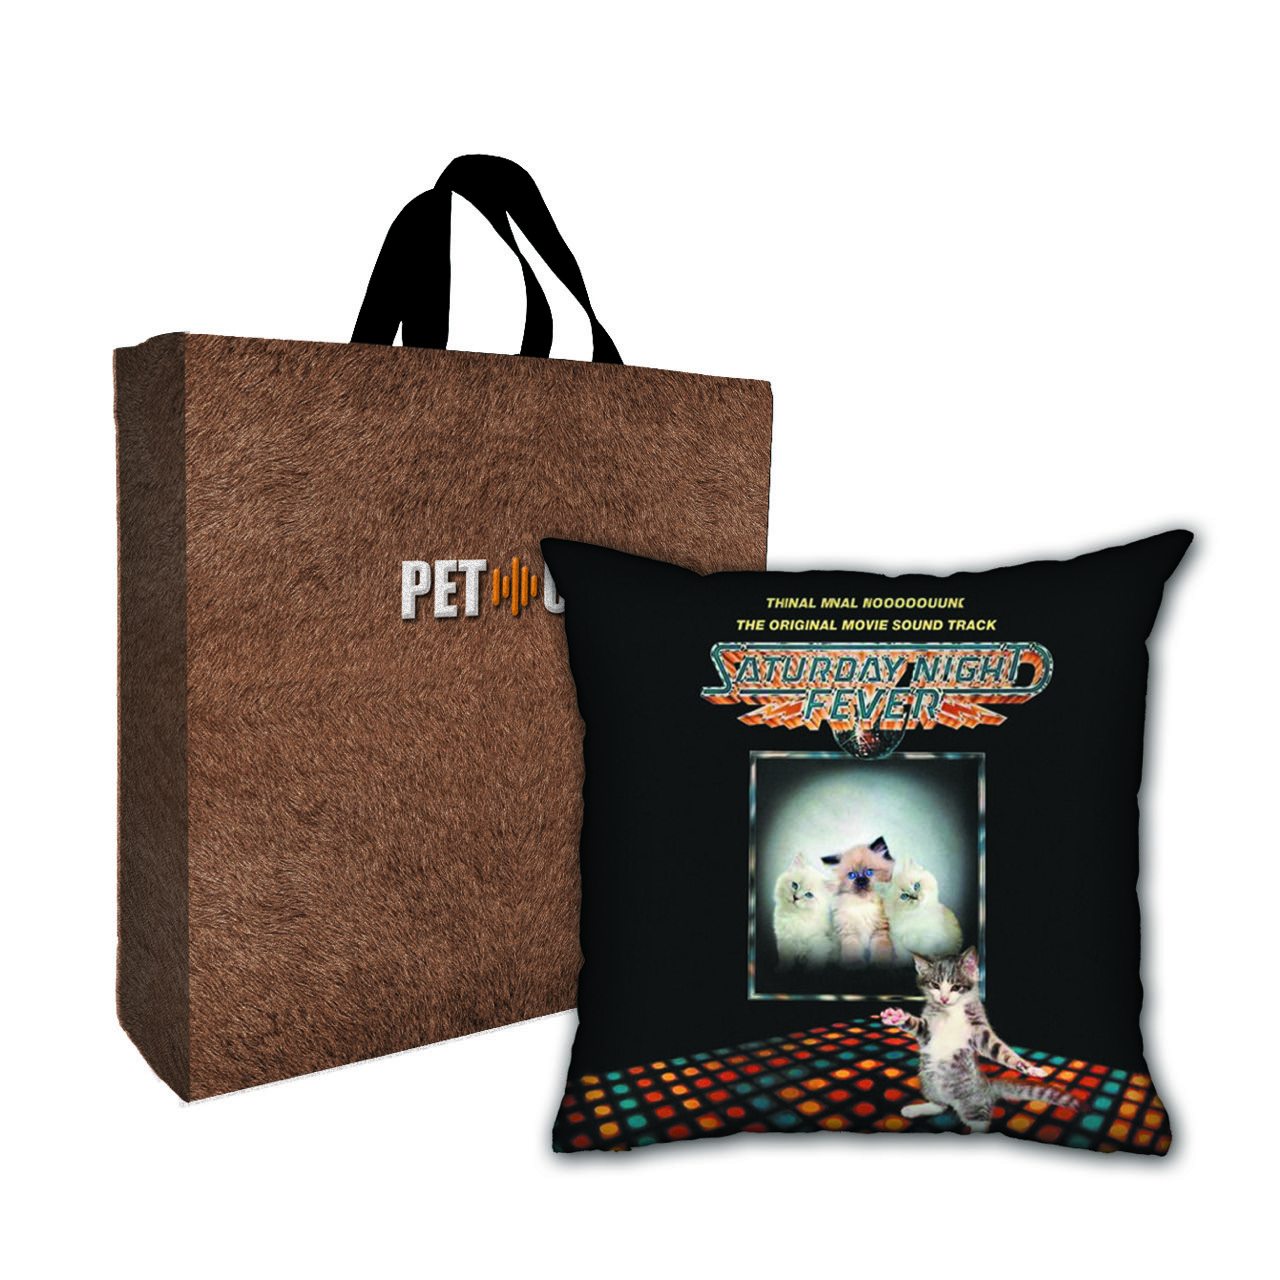 Kit Almofada & Sacola Bege Pet Use - Cat Fever - Gato